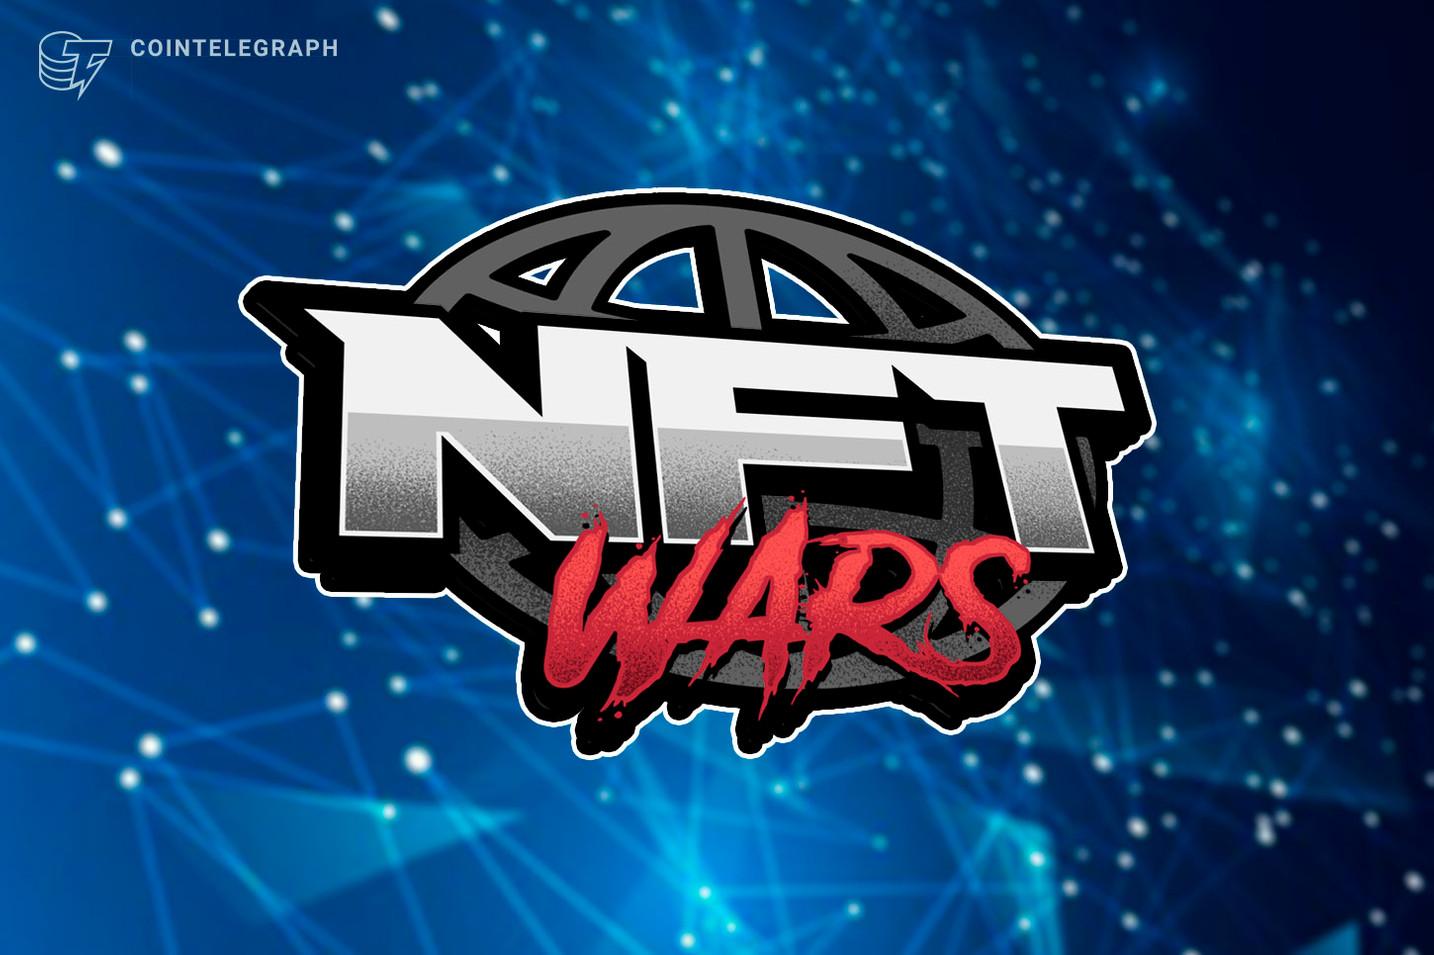 NFTWars, a decentralized NFT game with massive potential